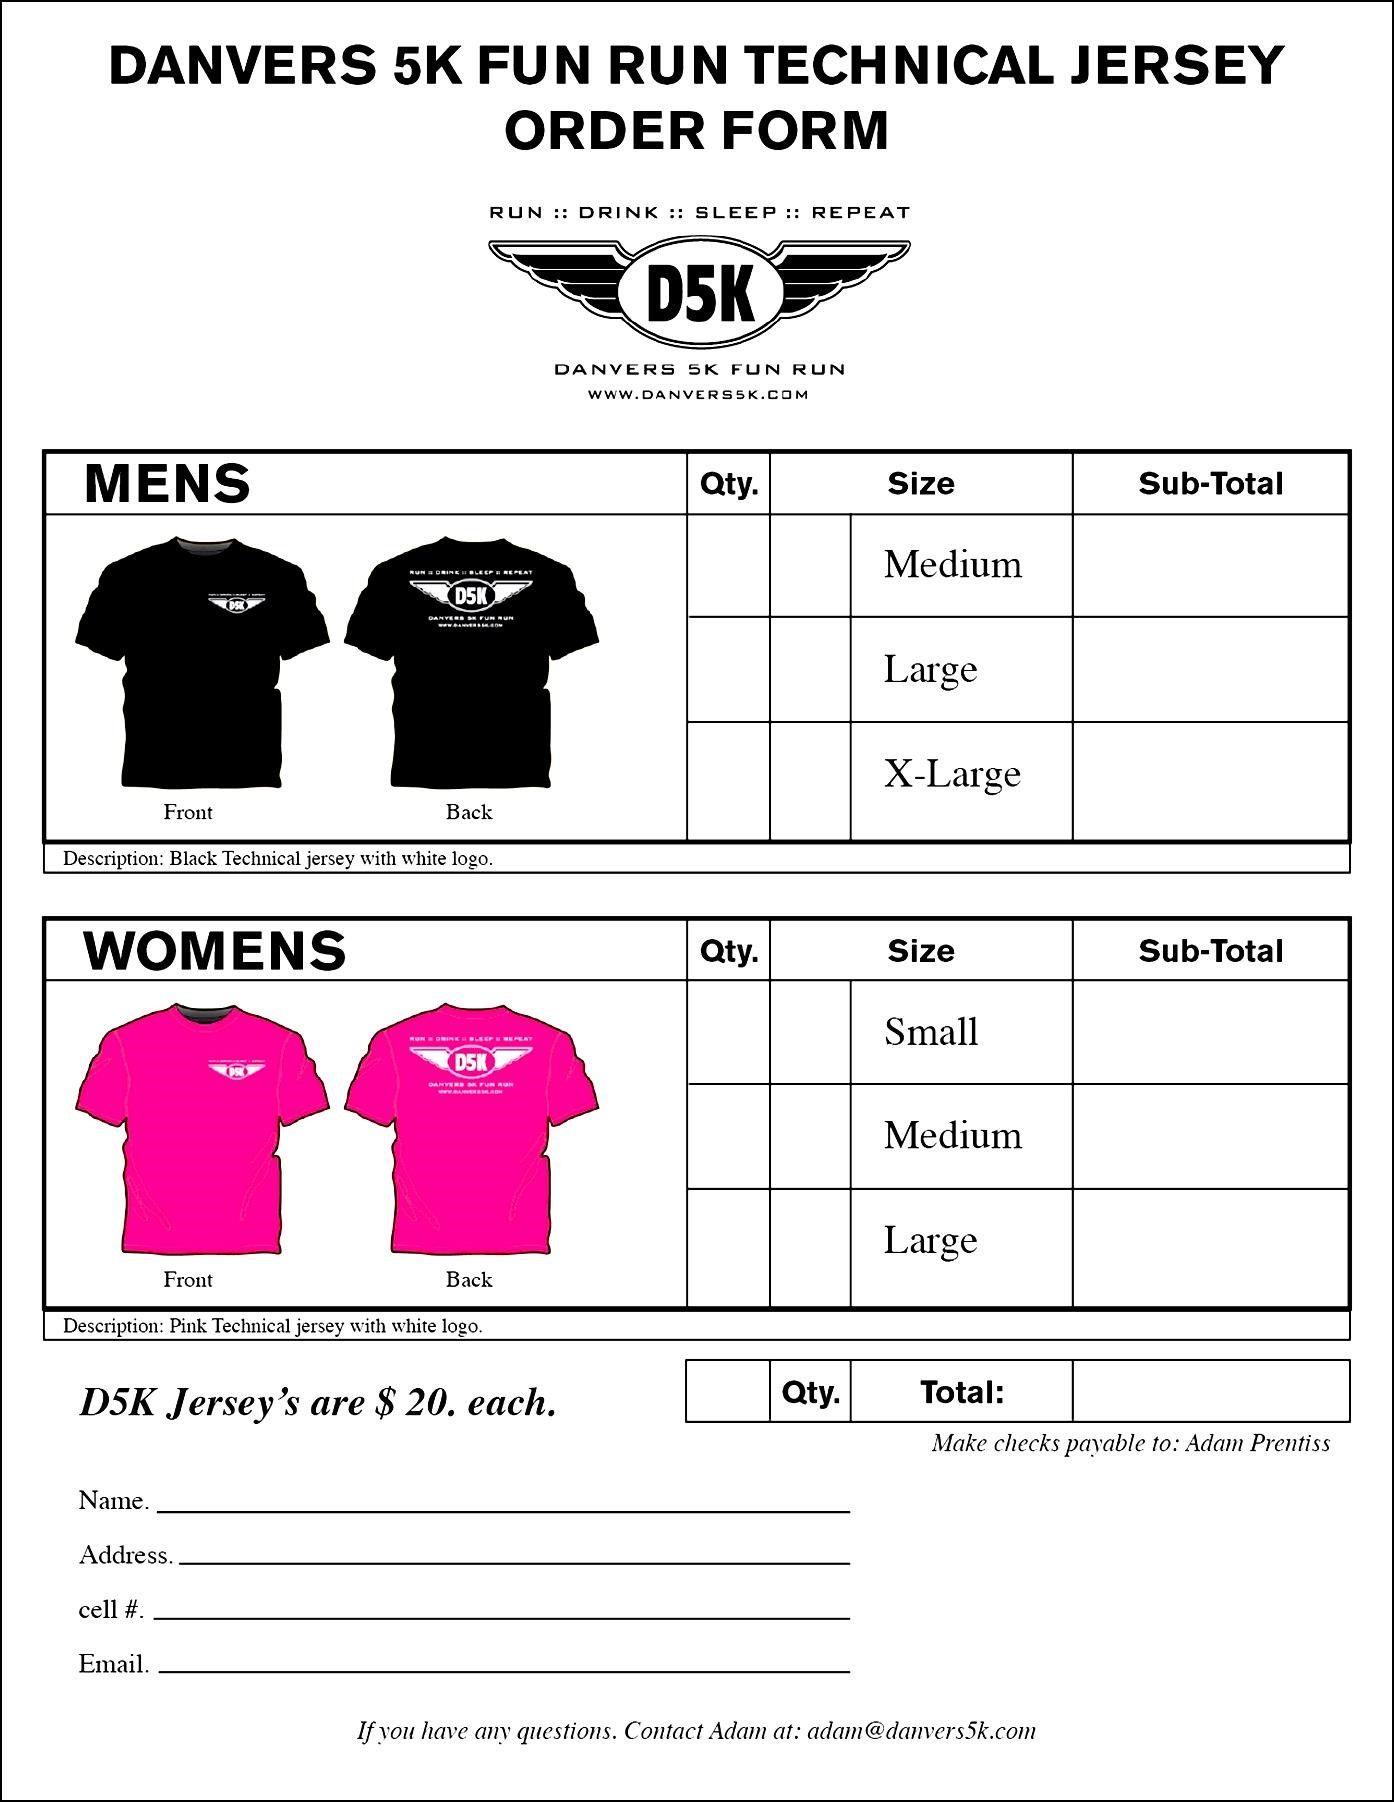 T Shirt Order Form Besttemplates123 Fundraising Order Form Order Form Template Order Form